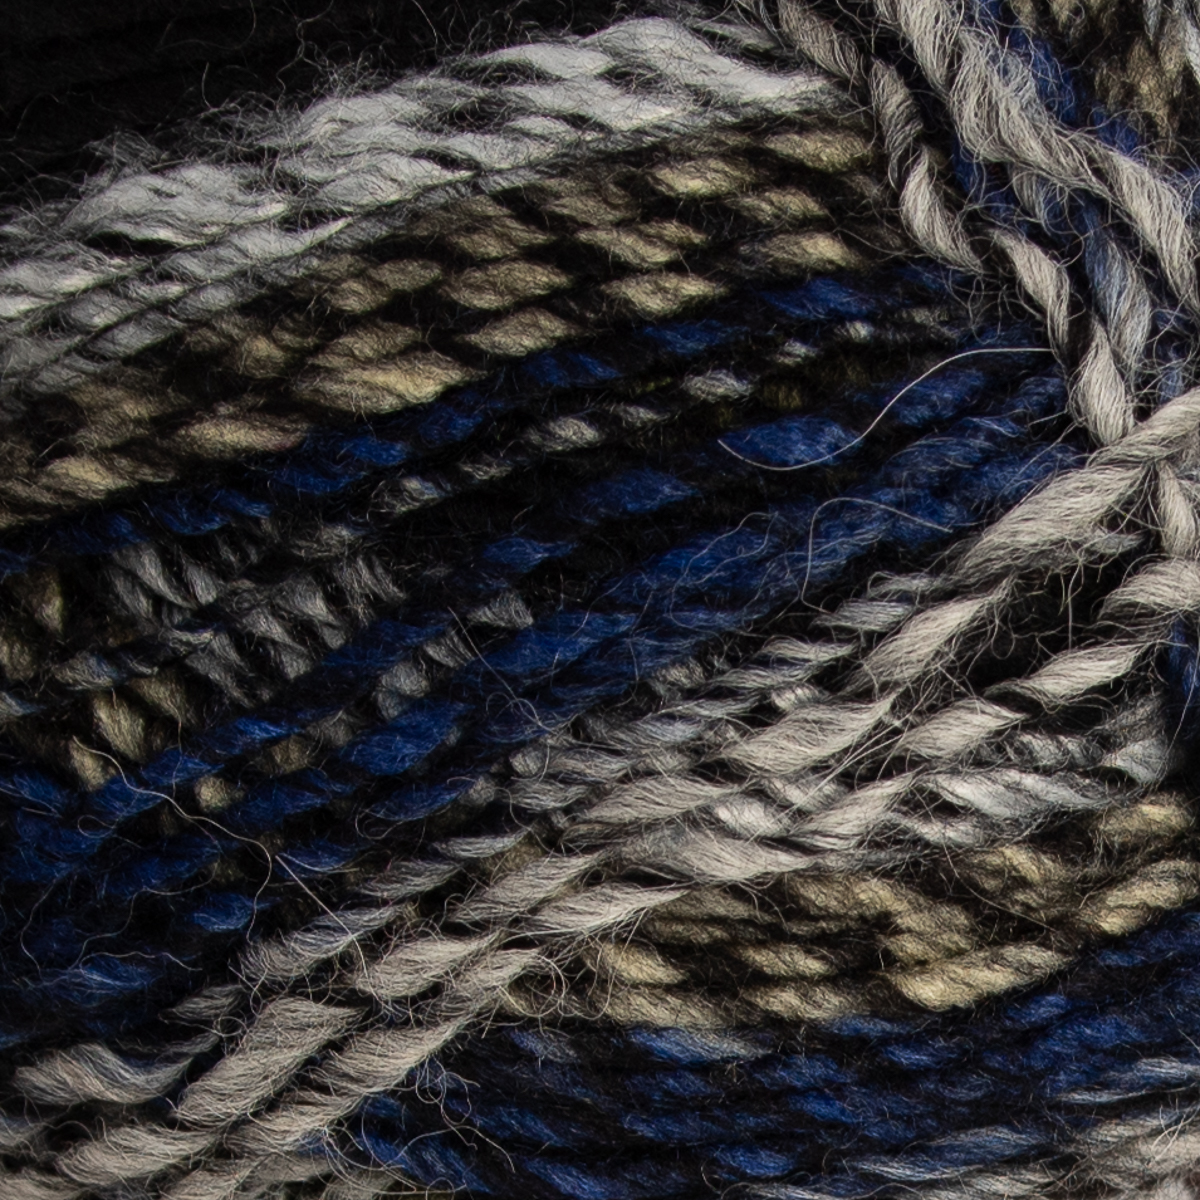 3pk-Premier-Yarn-Isaac-Mizrahi-NY-Skyscraper-Acrylic-Blend-Yarn-5-Bulky-Skeins thumbnail 23